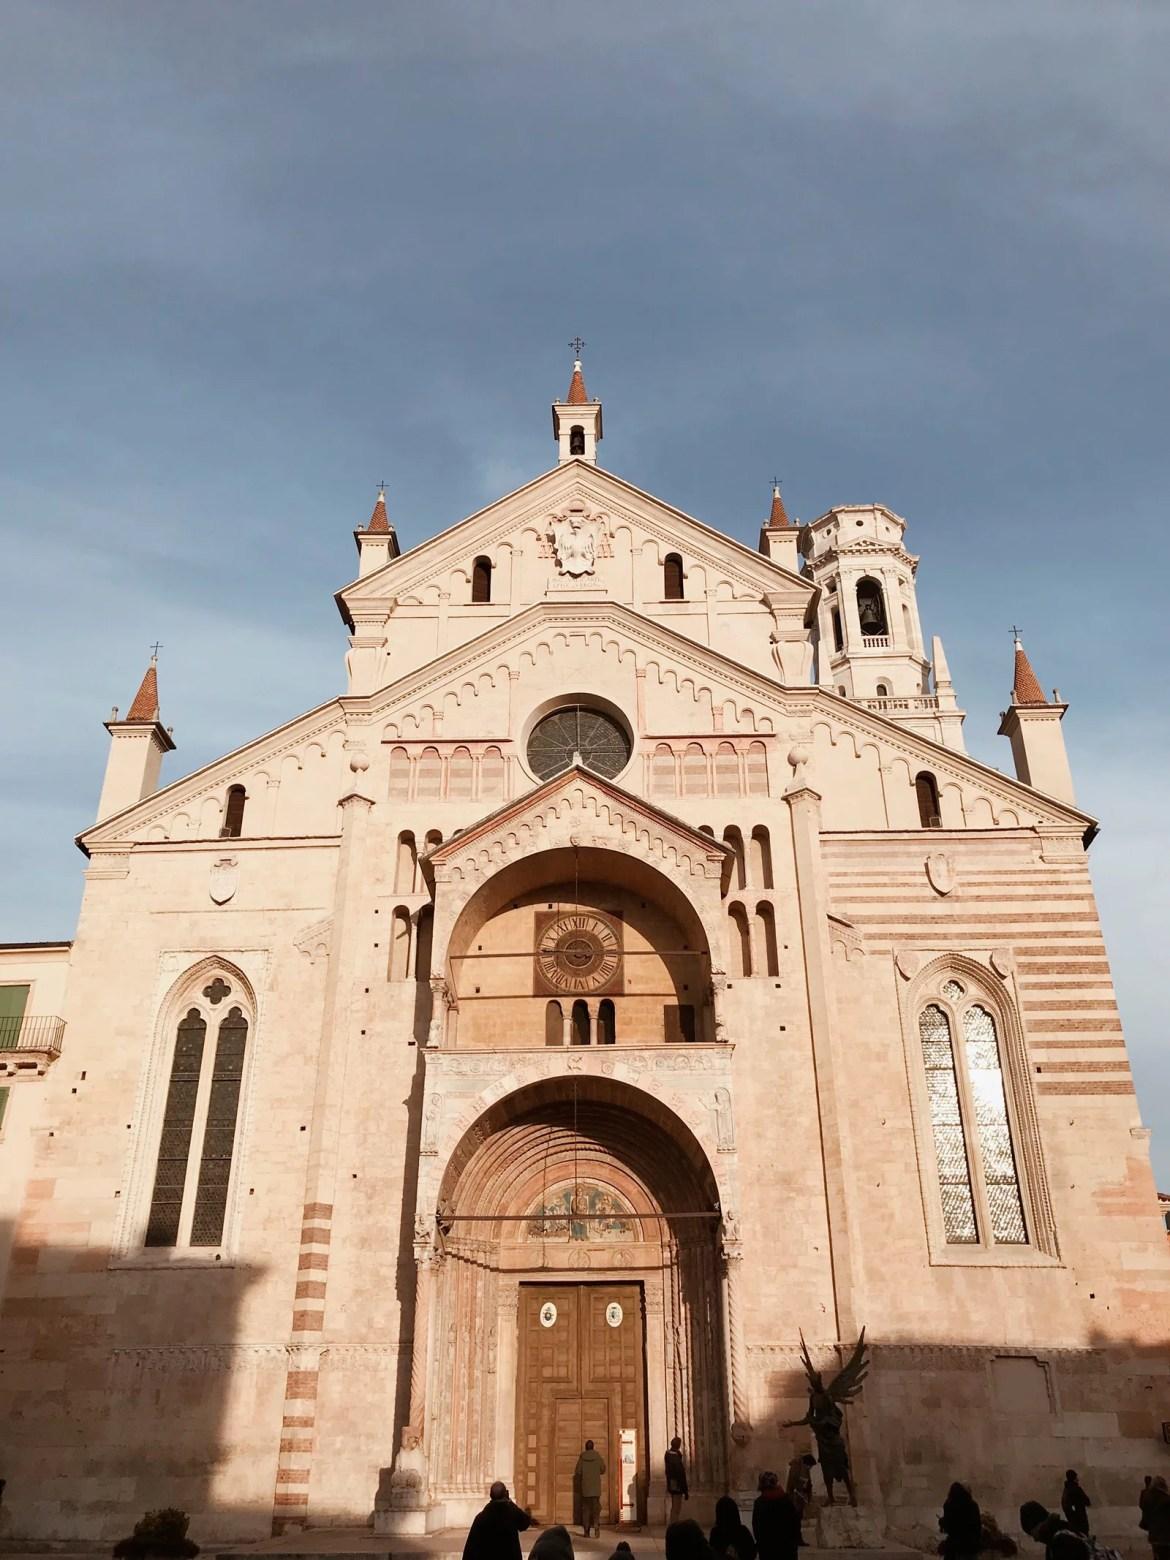 A catedral de Verona